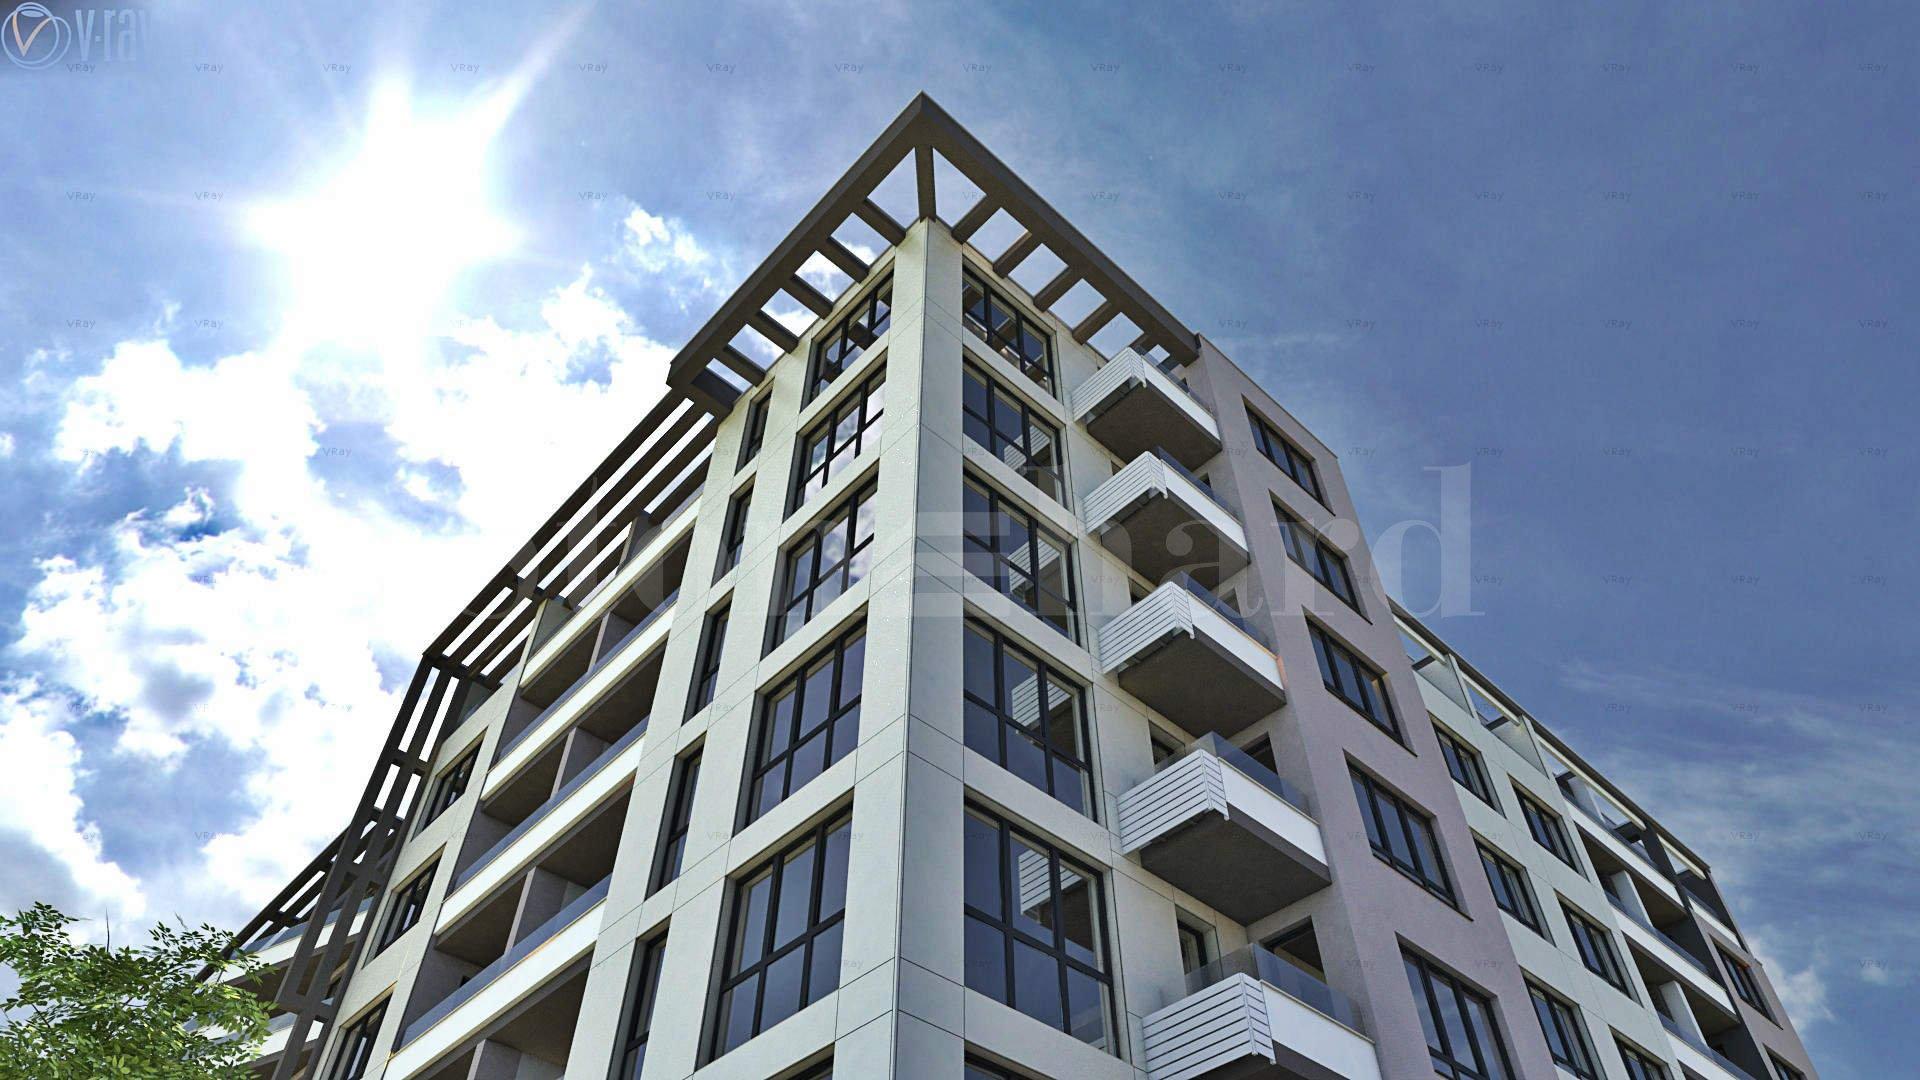 Елегантна нова жилищна сграда в кв. Витоша  1 - Stonehard